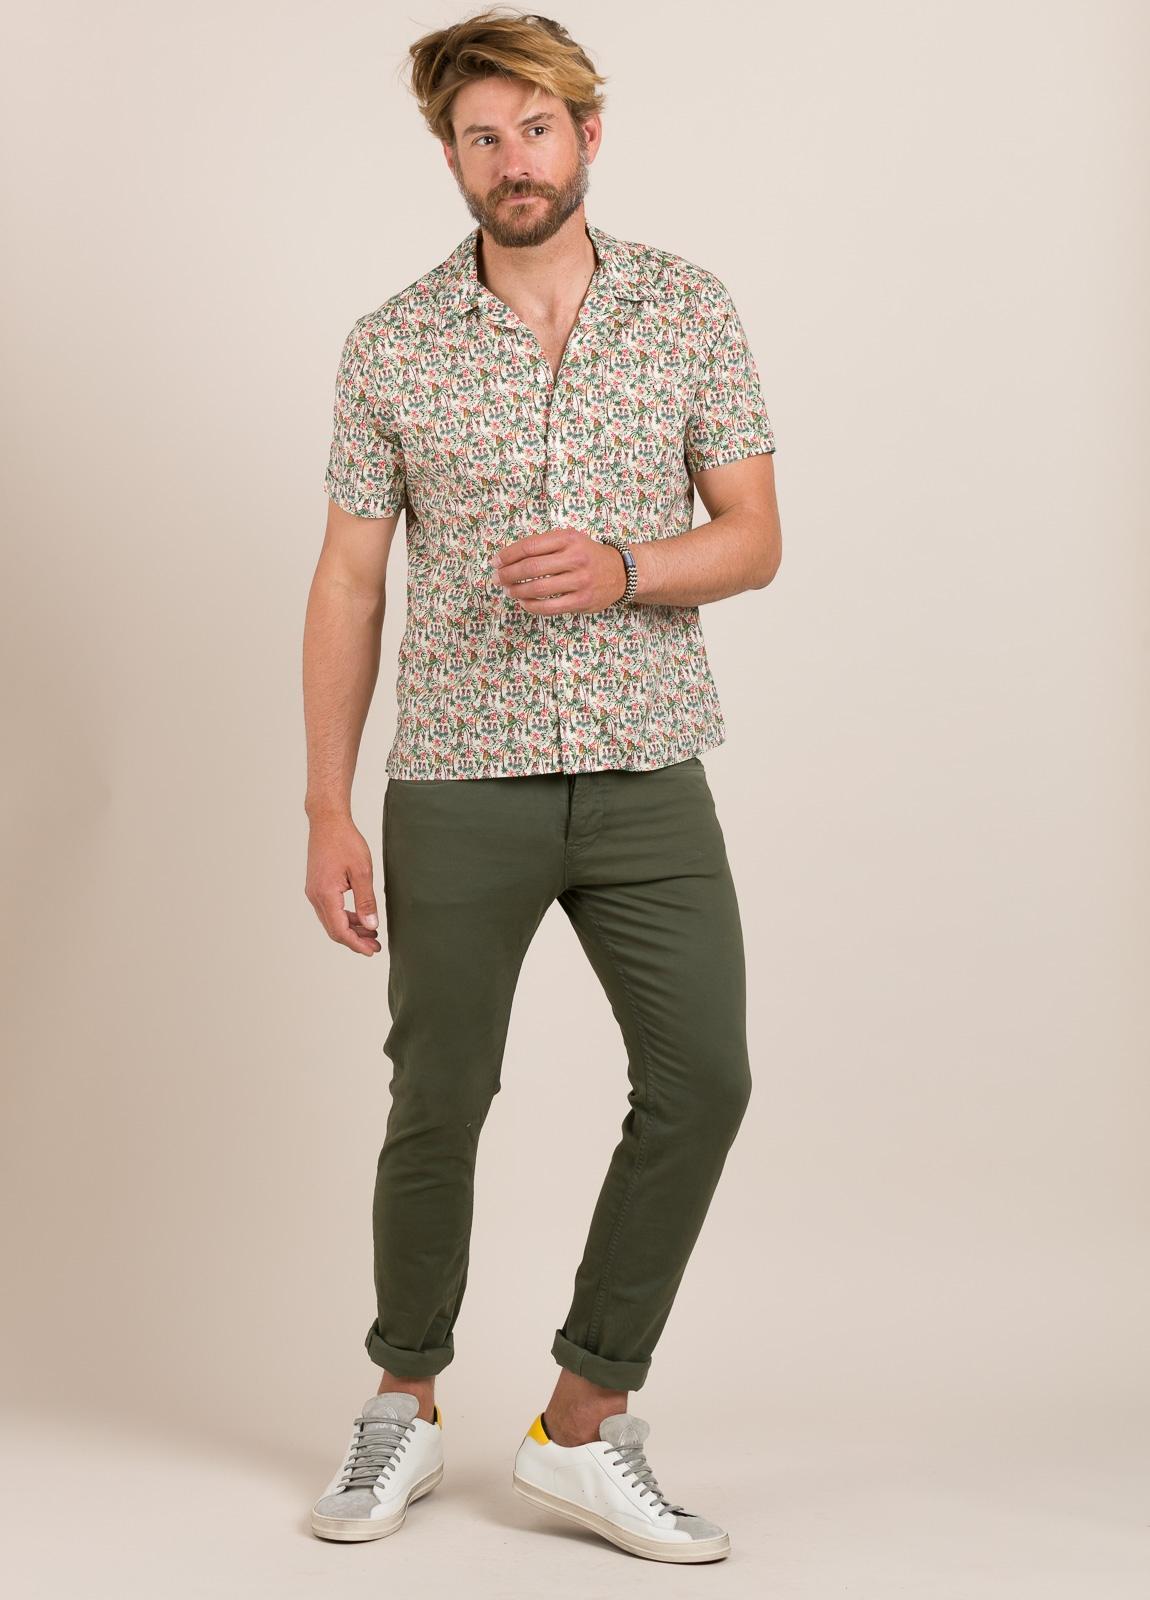 Camisa sport FUREST COLECCIÓN modelo HAWAI TOM crudo - Ítem1